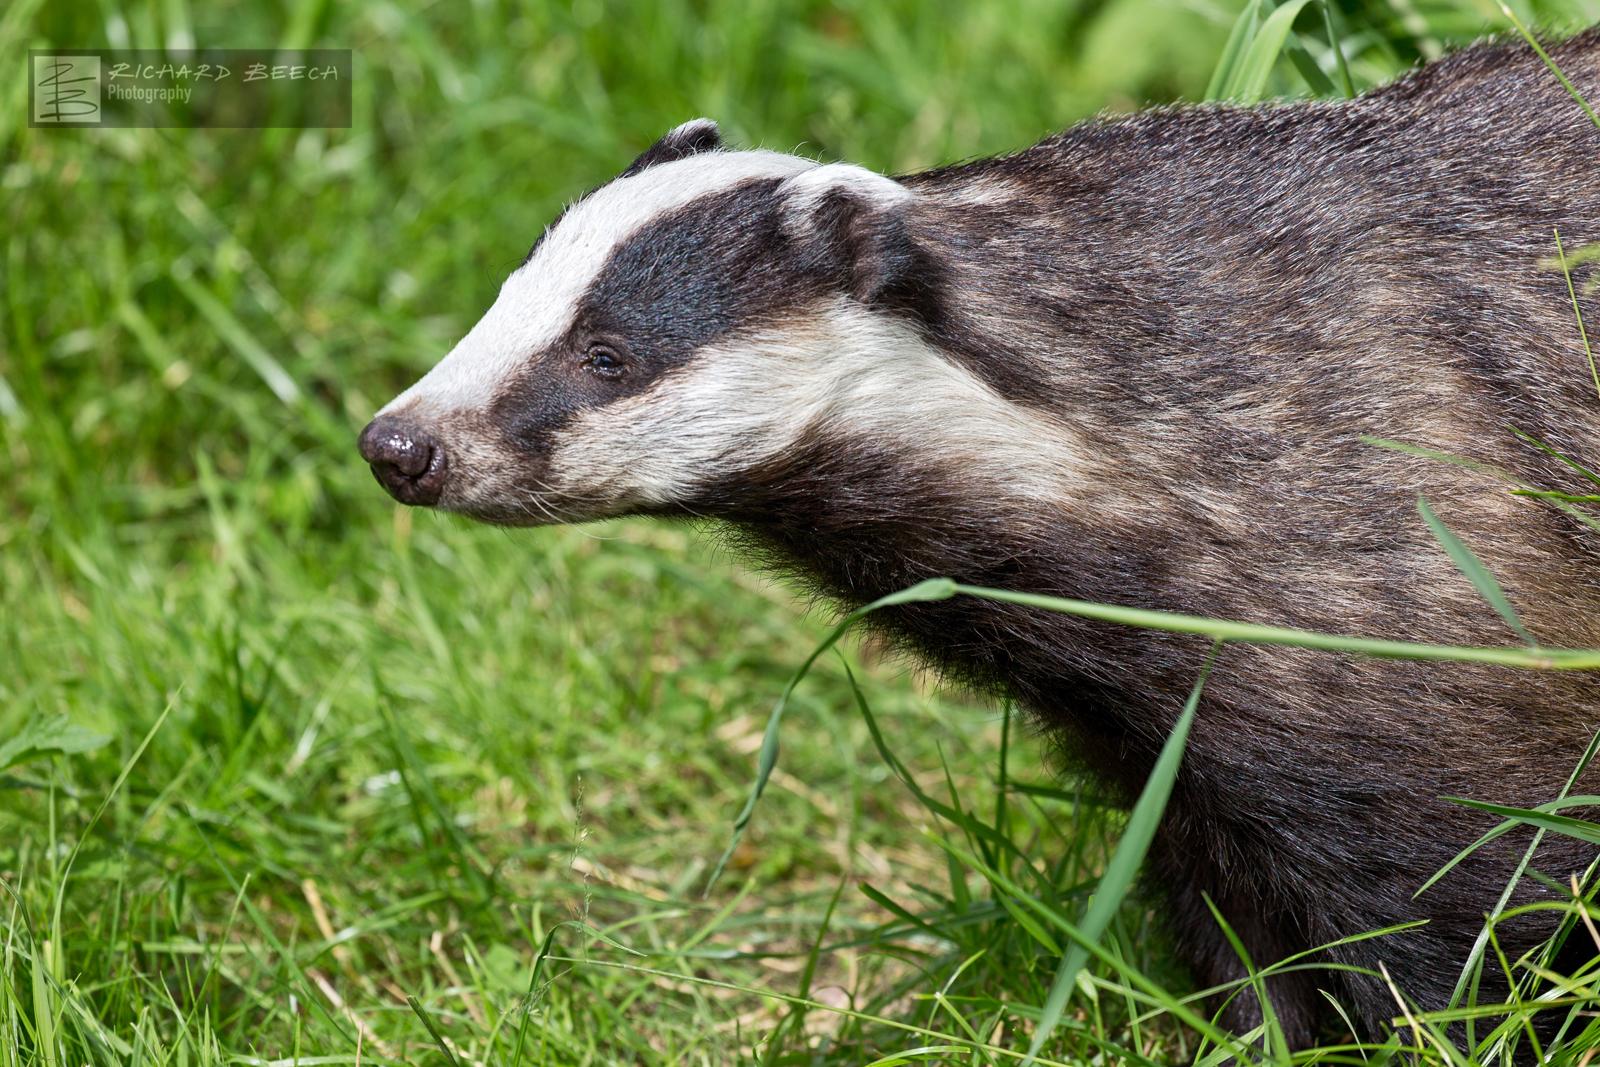 Badger Waking Up